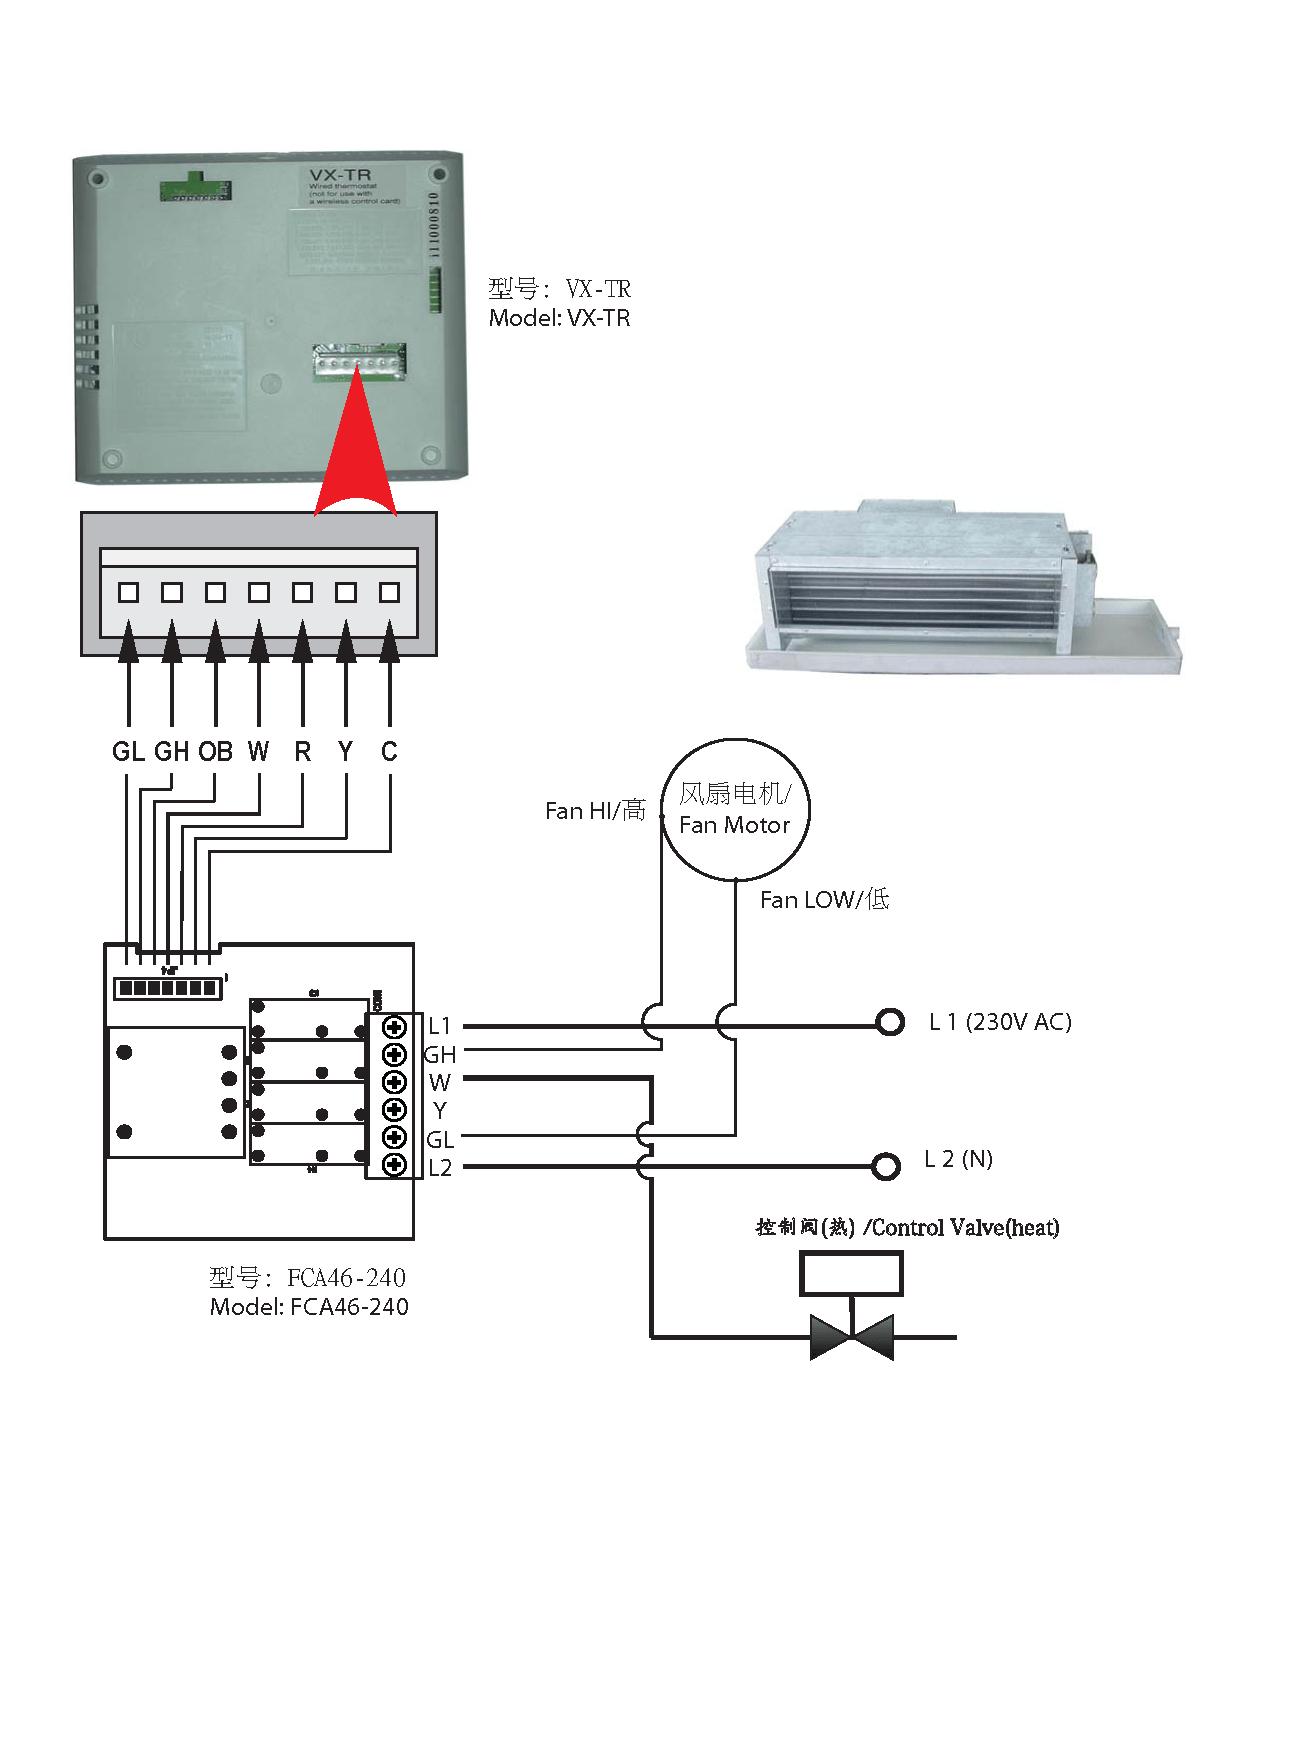 Fan coil wiring diagram 2 pipes?zoom\\\\\\\\\\\\\\\=2.625\\\\\\\\\\\\\\\&resize\\\\\\\\\\\\\\\=665%2C899 carolina skiff wiring diagram gandul 45 77 79 119  at edmiracle.co